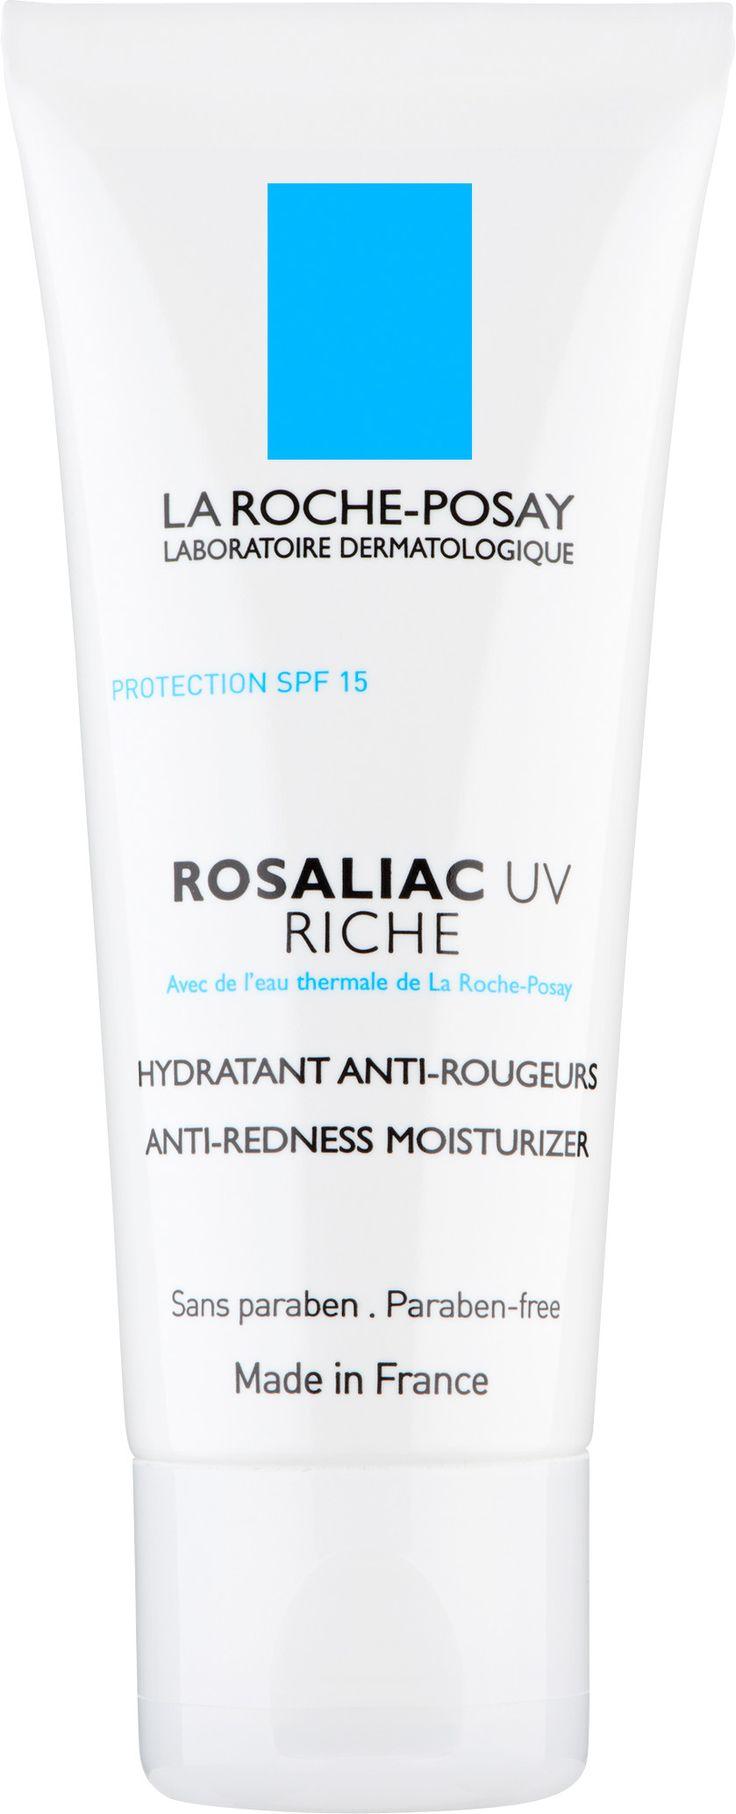 La Roche-Posay Rosaliac UV Riche Fortifying Anti-Redness Moisturizer 40ml